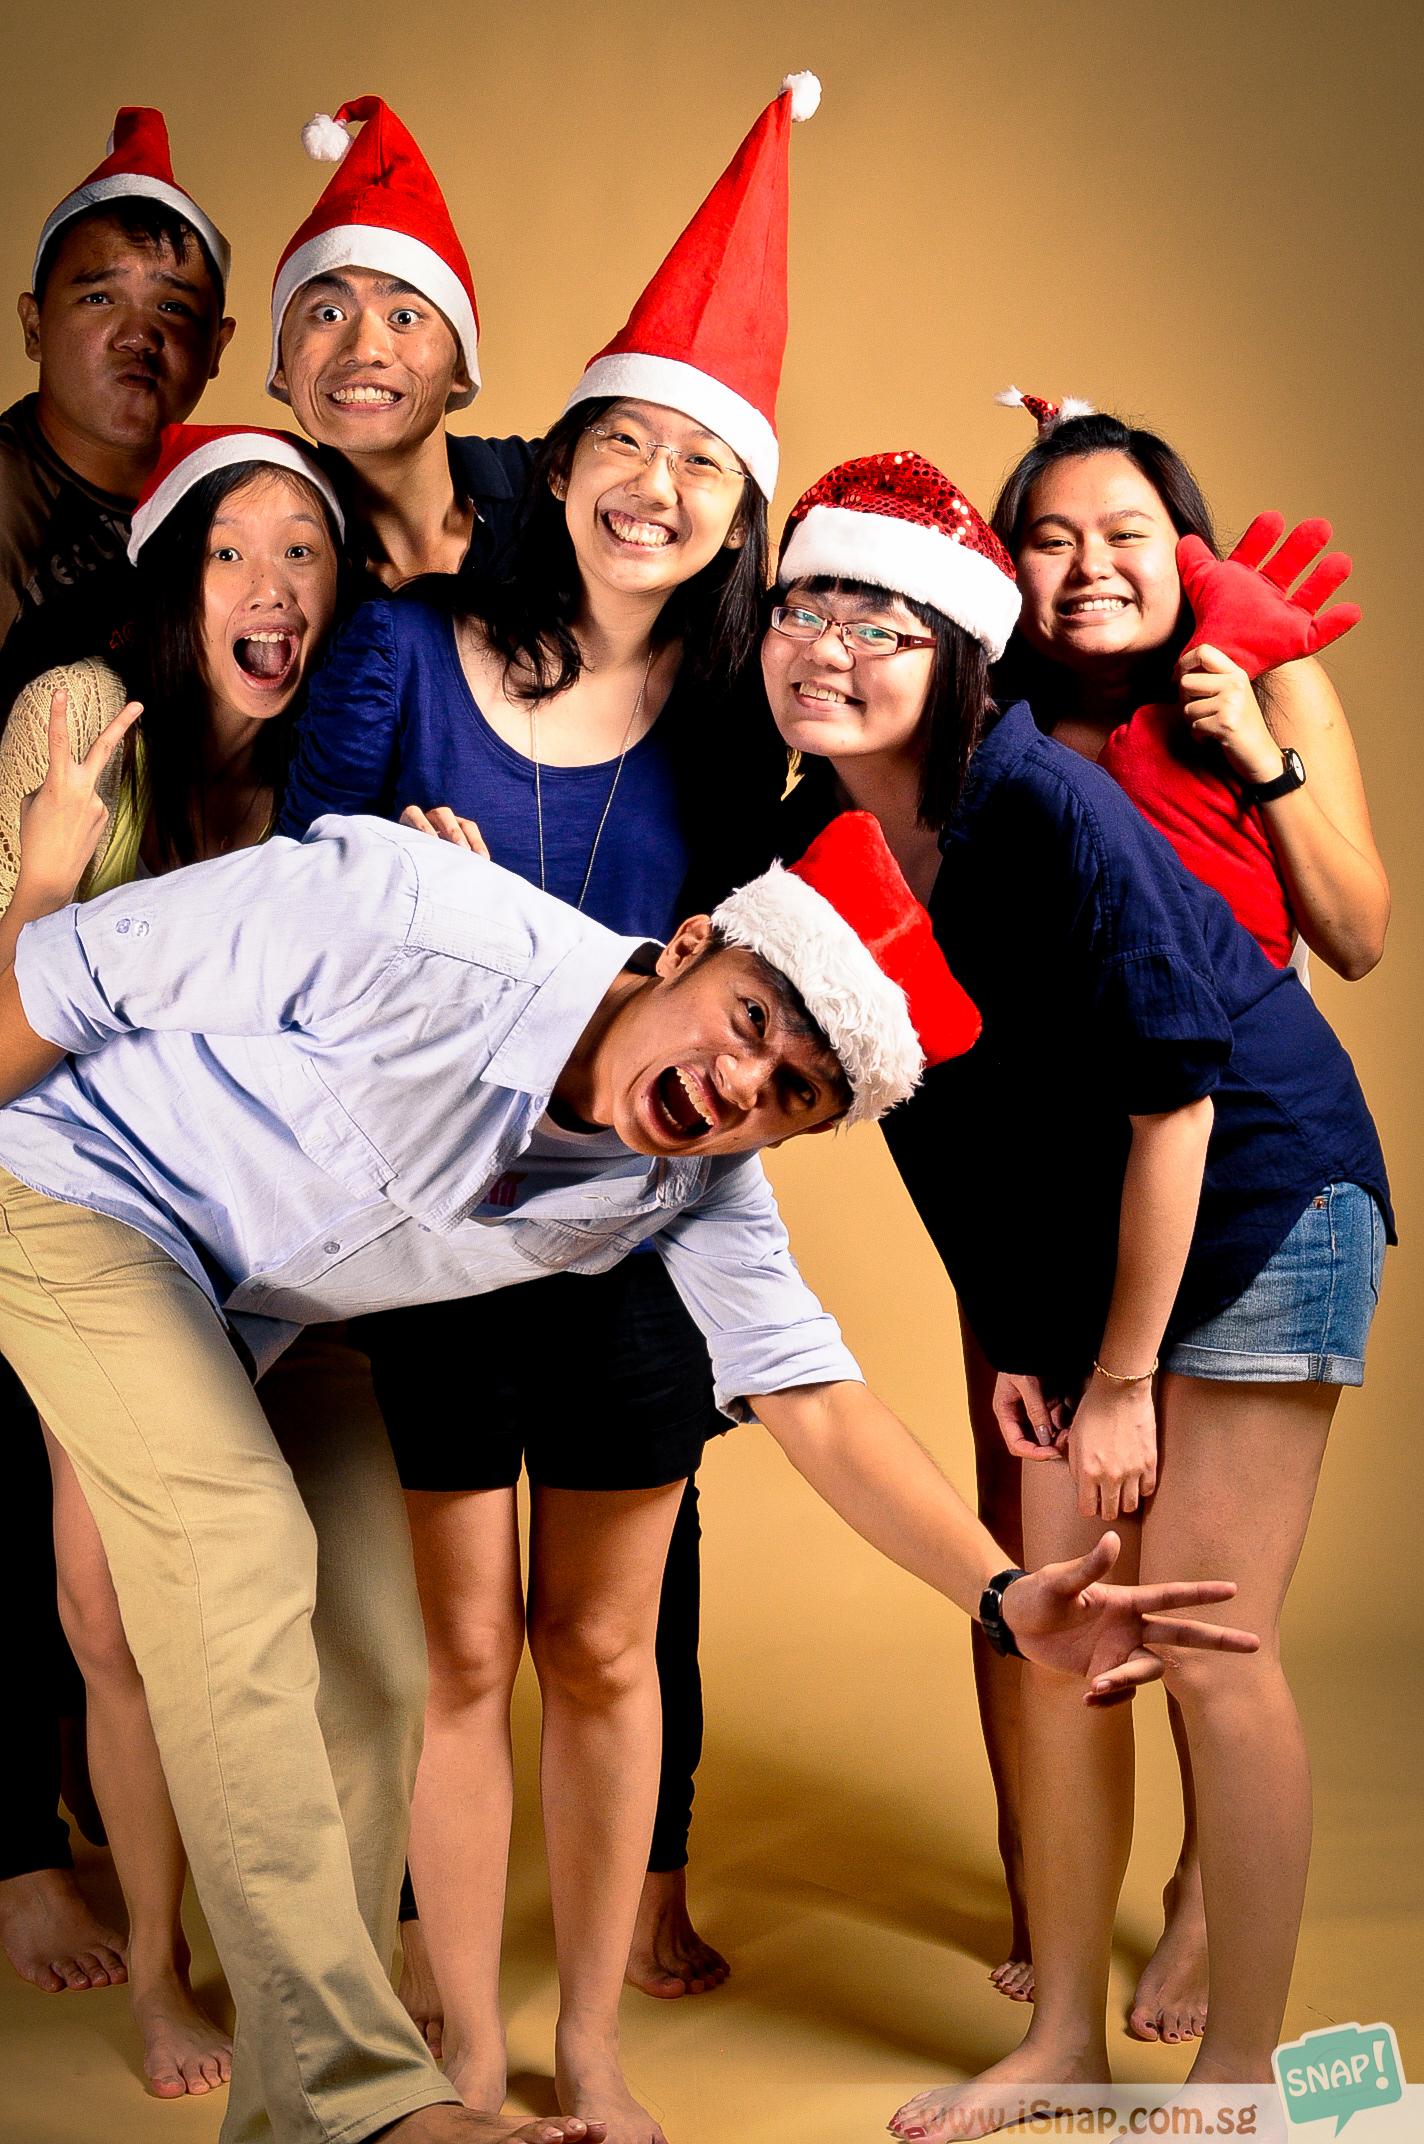 Snap! a Christmas